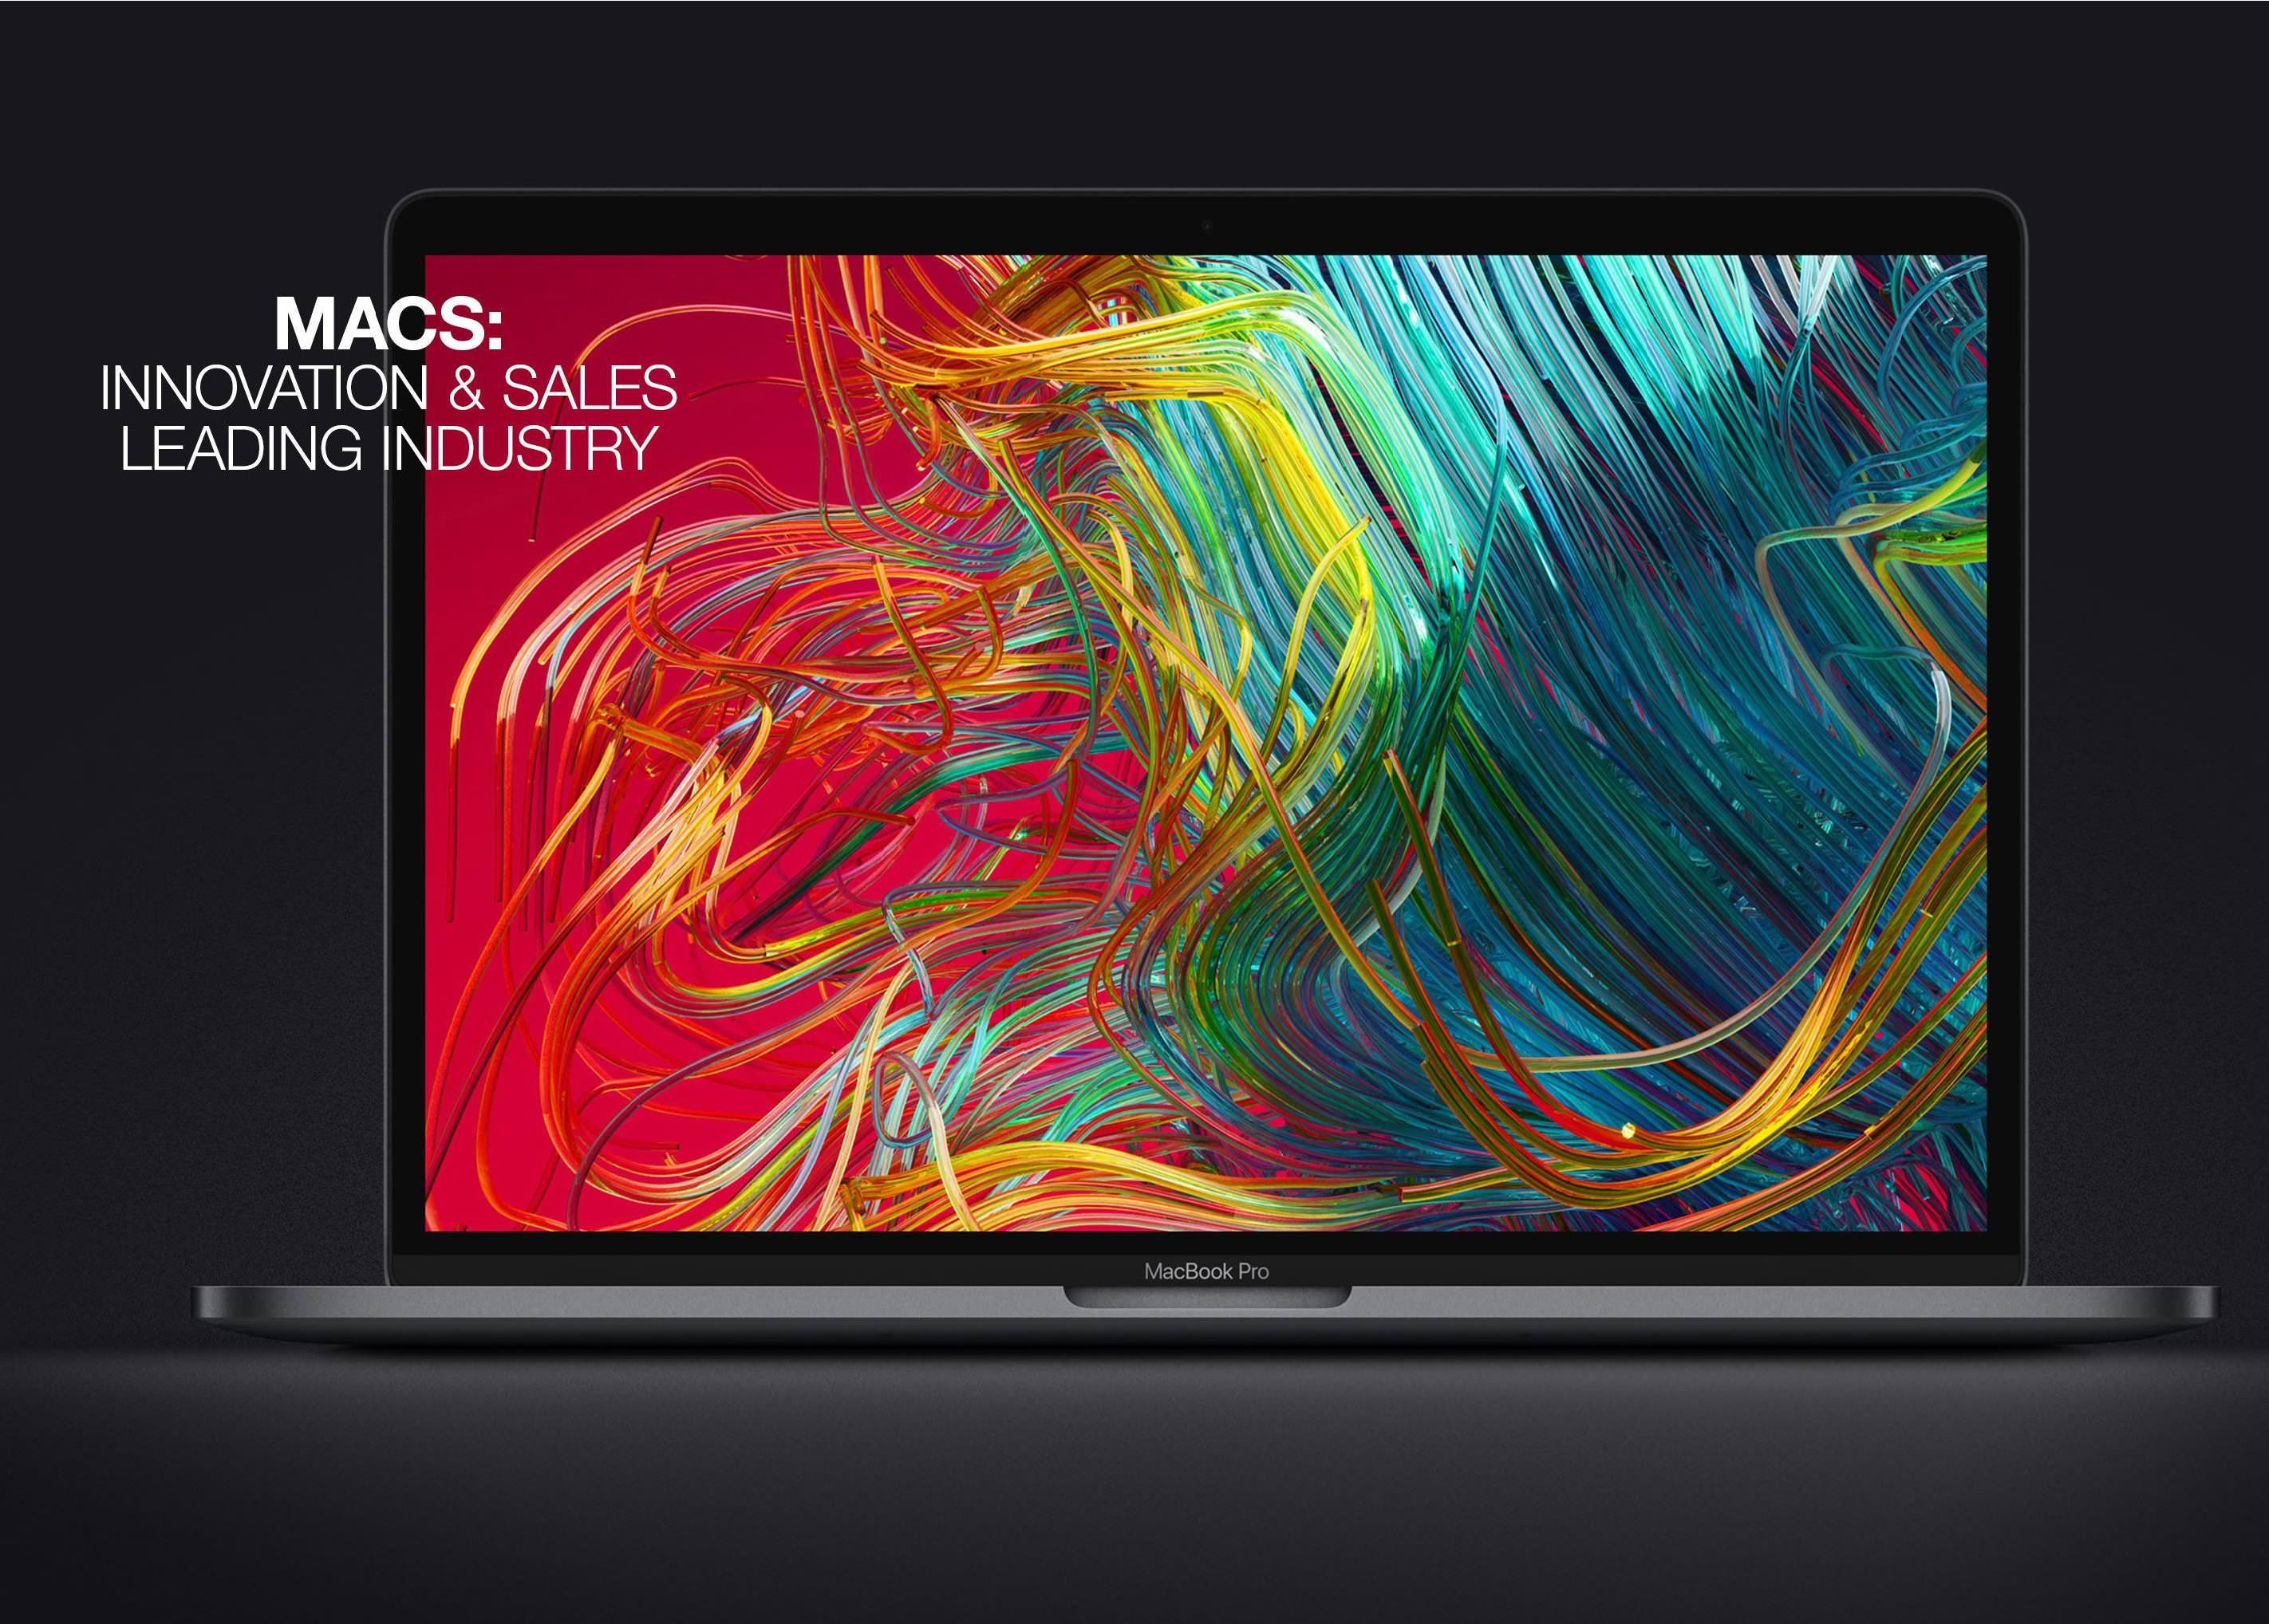 MACS: Innovation & Sales Leading Industry